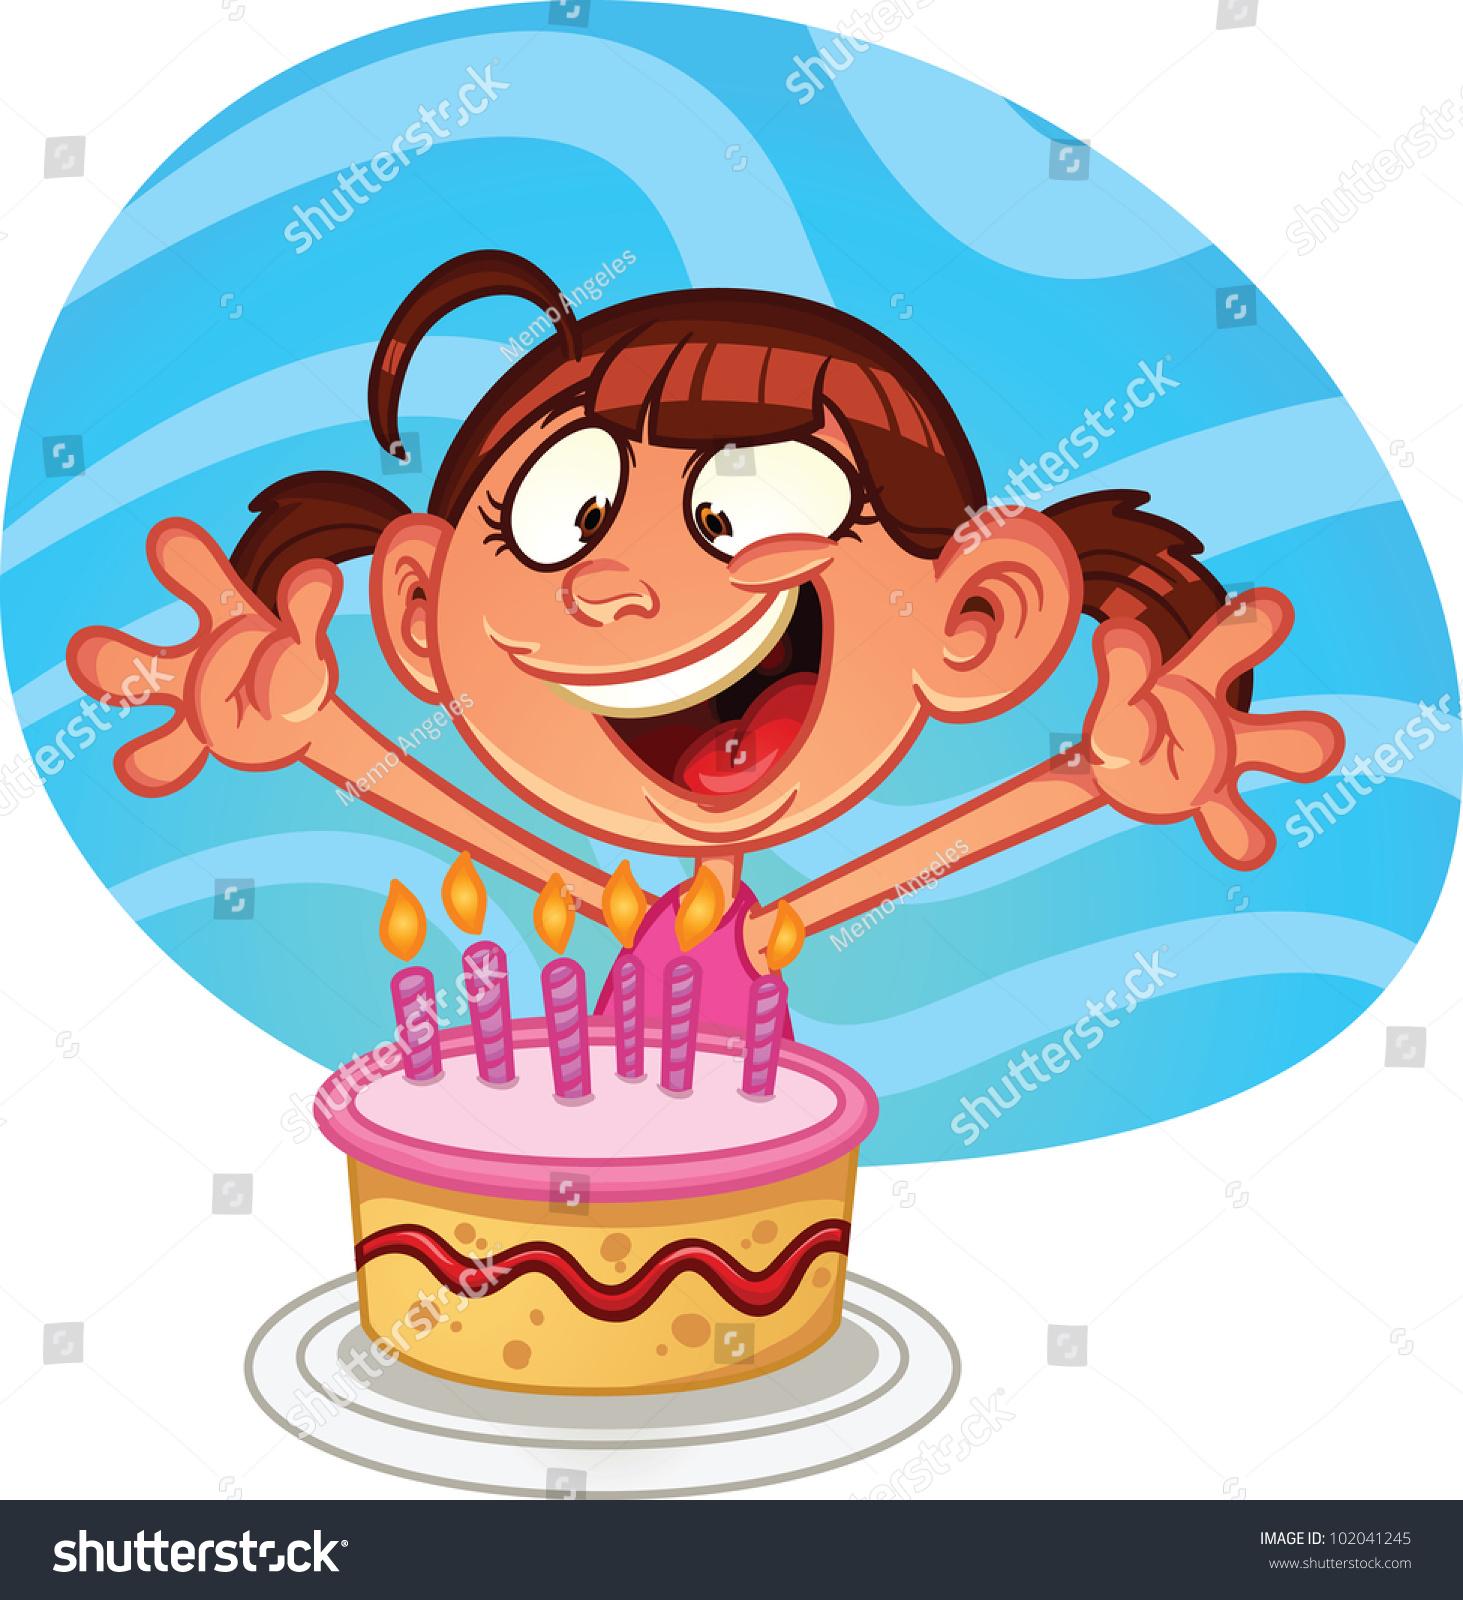 Cute Cartoon Cake Images : Cute Cartoon Birthday Girl Cake Vector Stock Vector ...